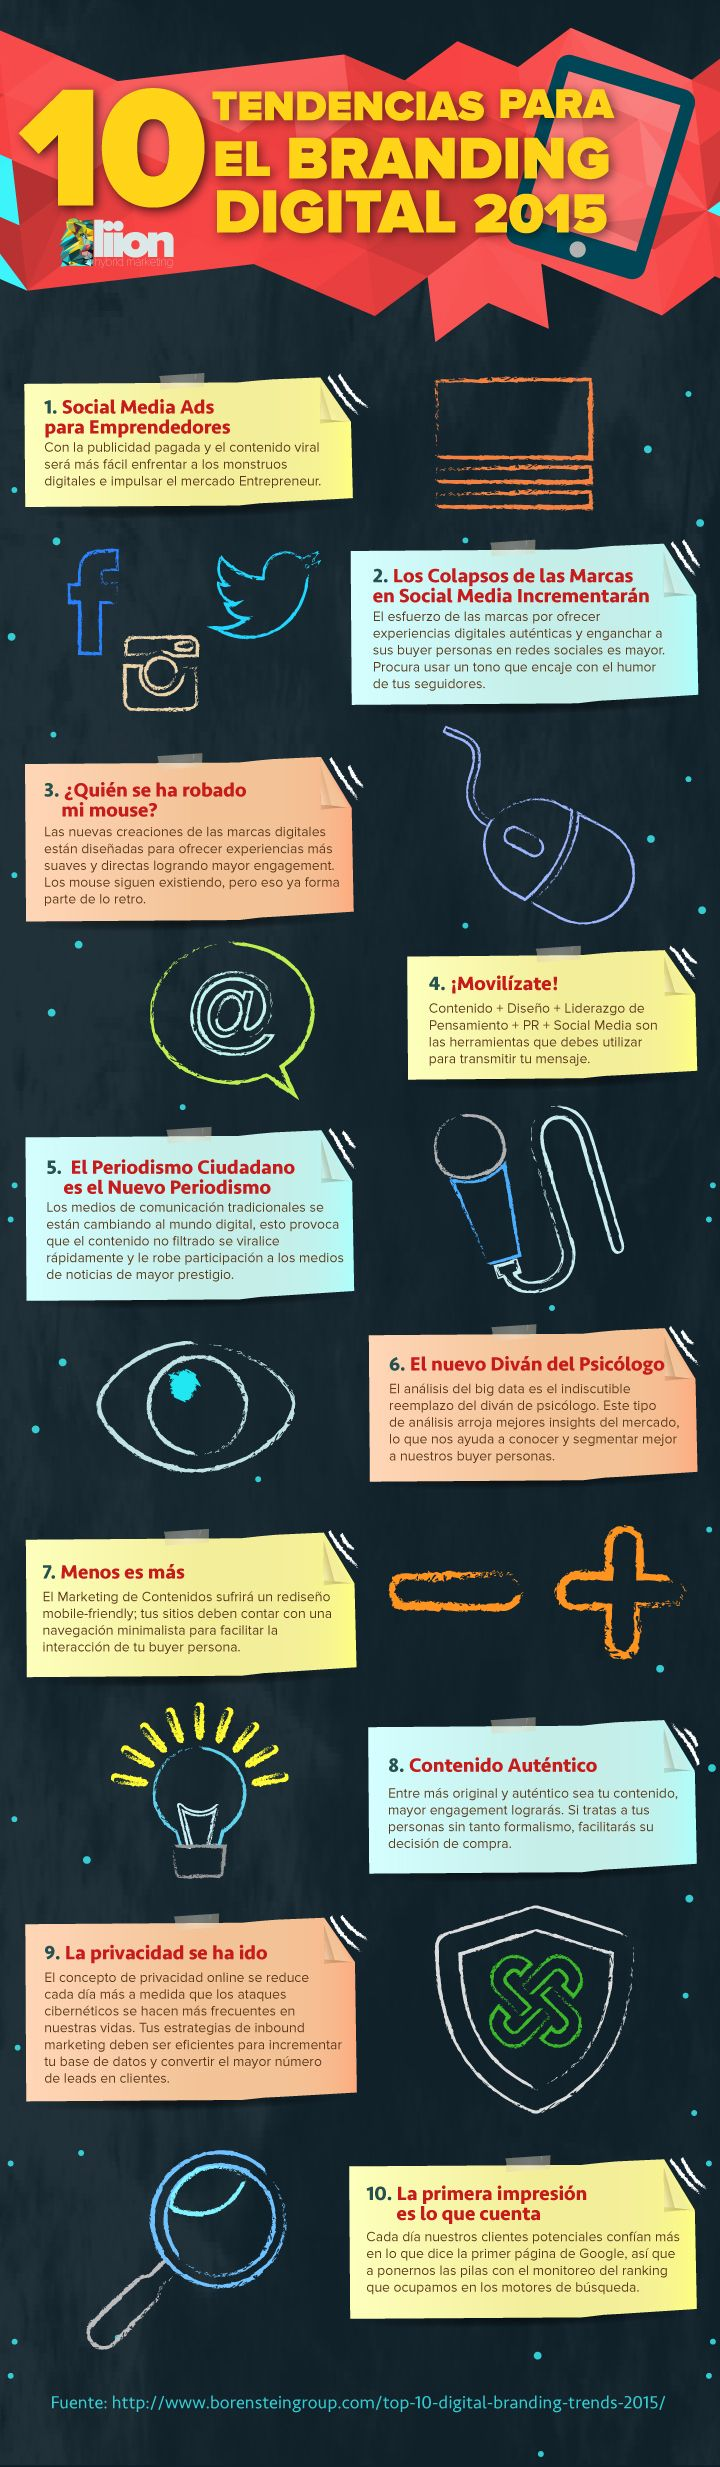 Tendencias en branding digital #infografia #infographic #marketing